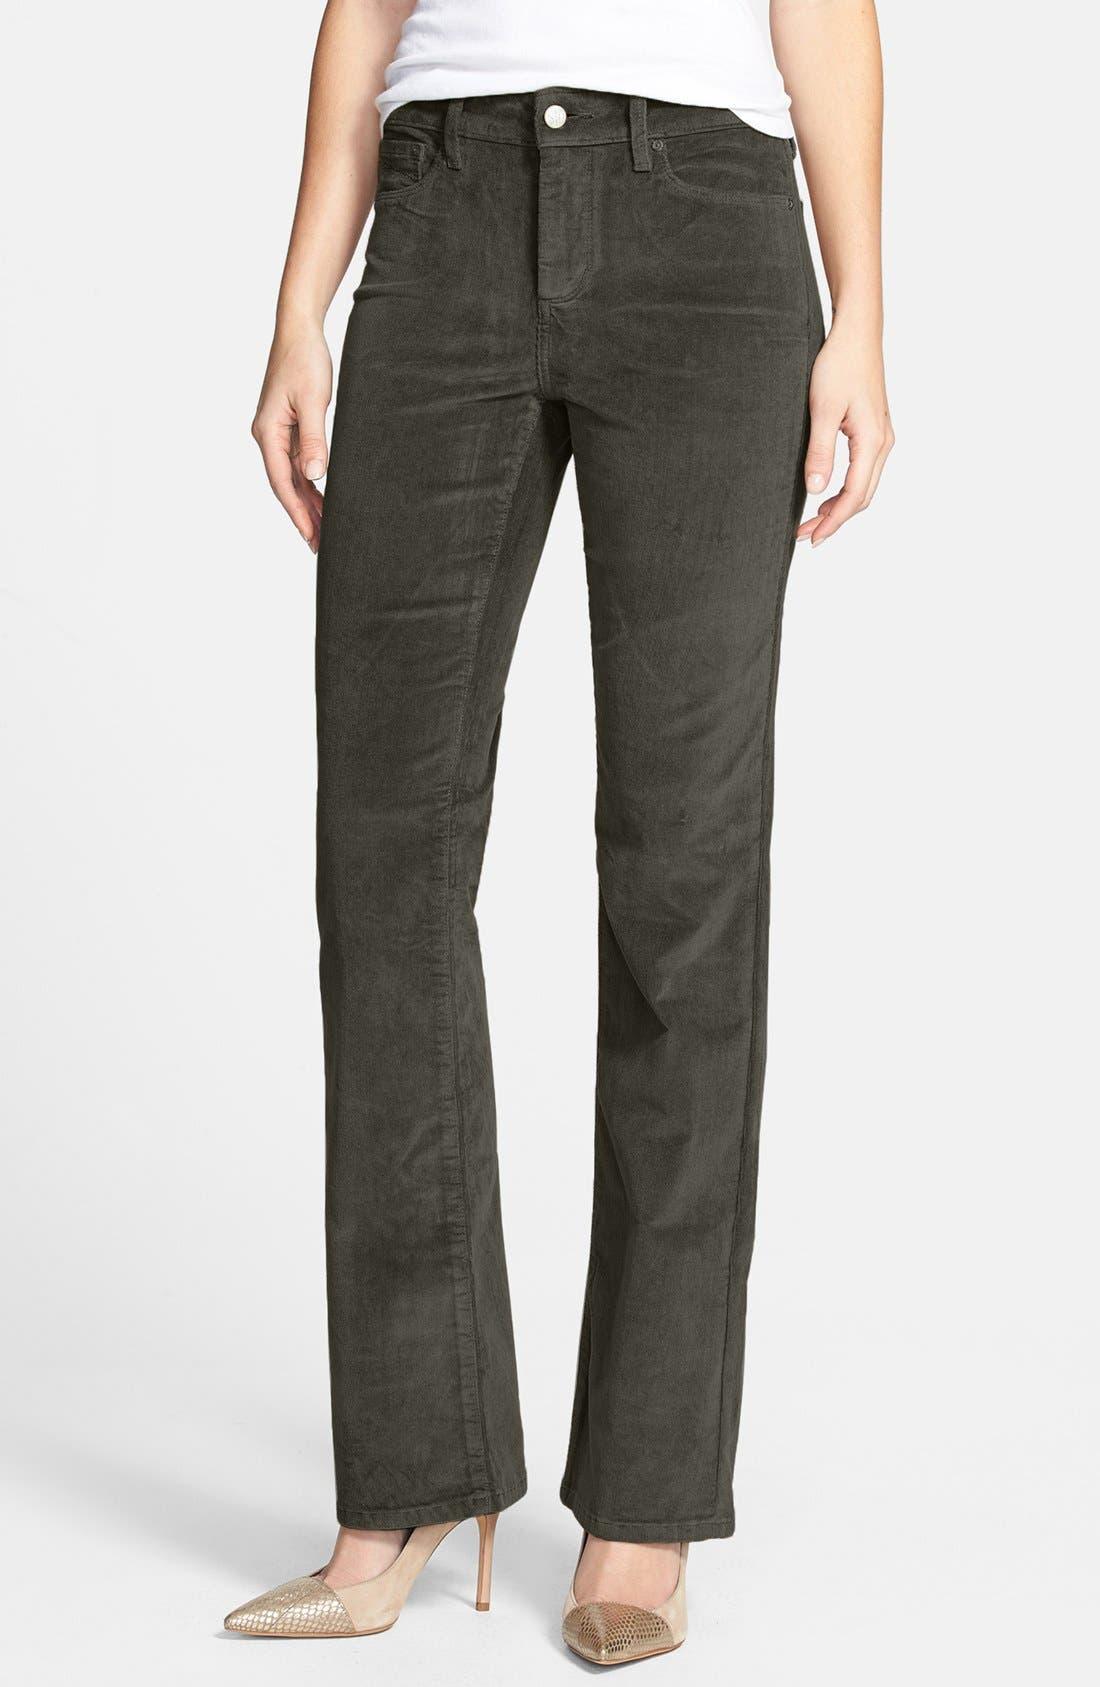 Main Image - NYDJ 'Barbara' Colored Stretch Corduroy Bootcut Pants (Regular & Petite)